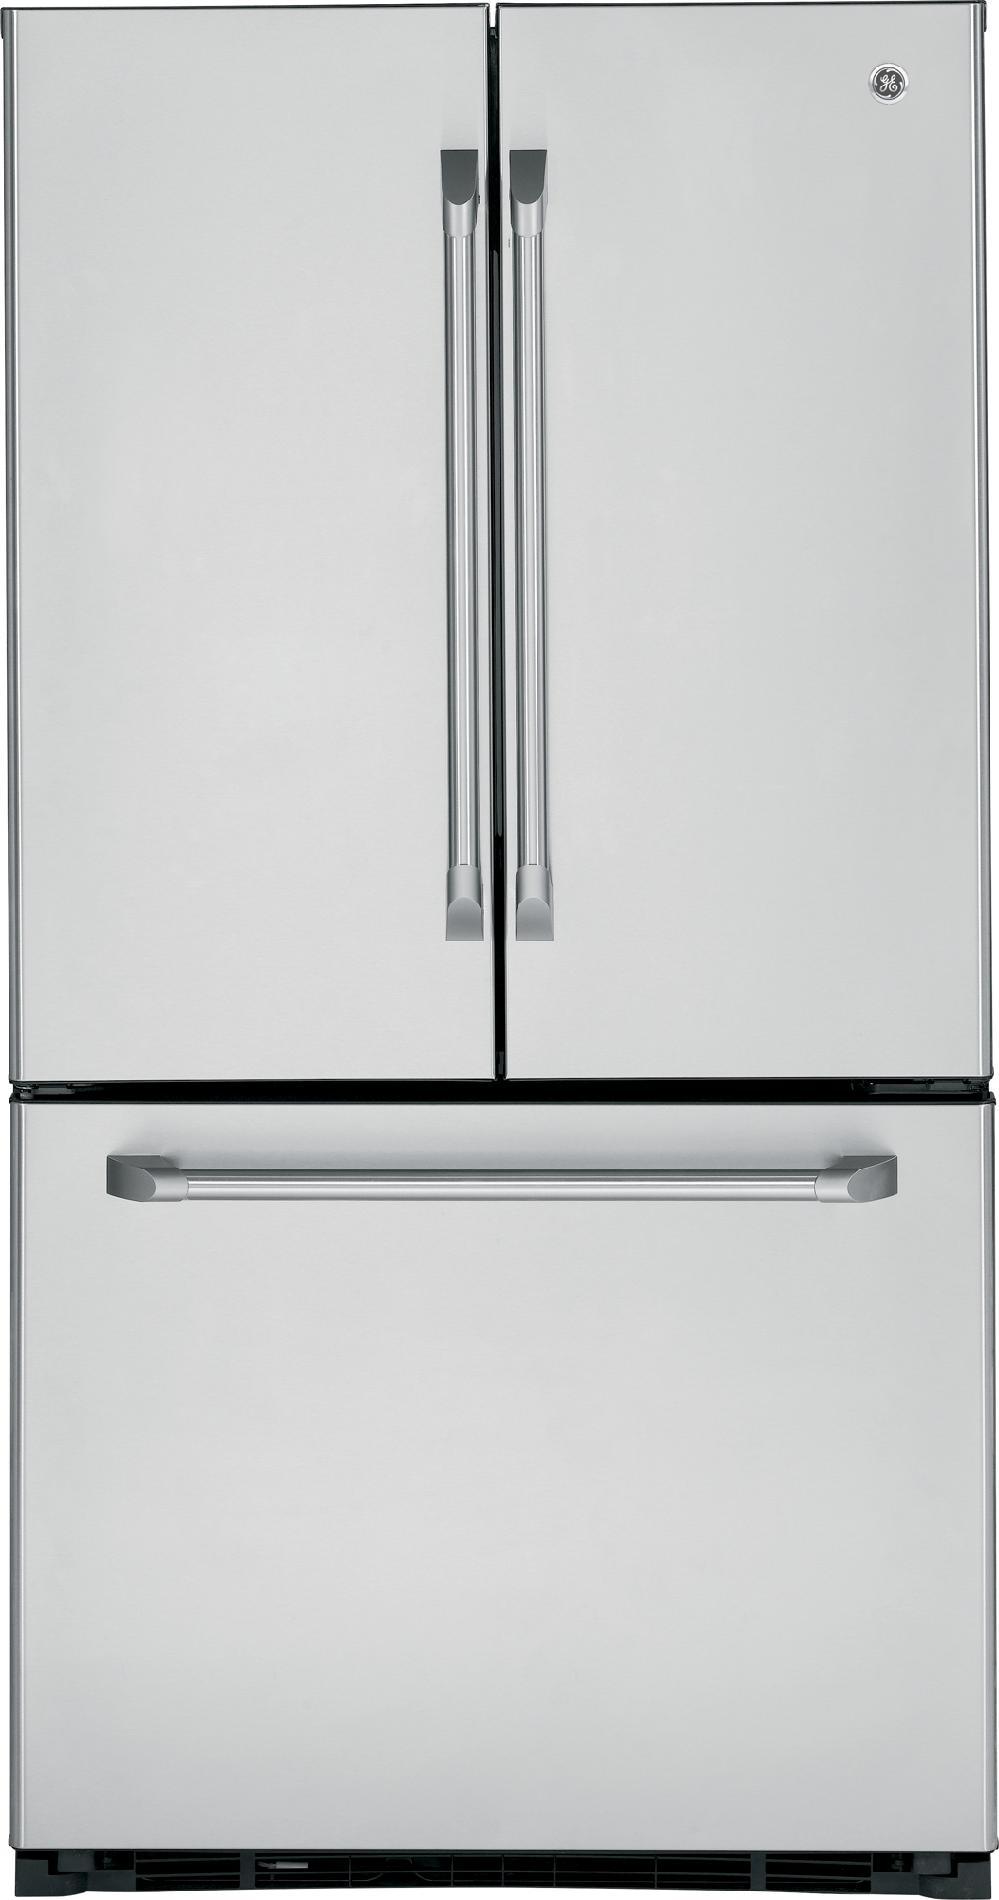 Ge Appliances Cfcp1nizss Caf 233 Series 20 8 Cu Ft Counter